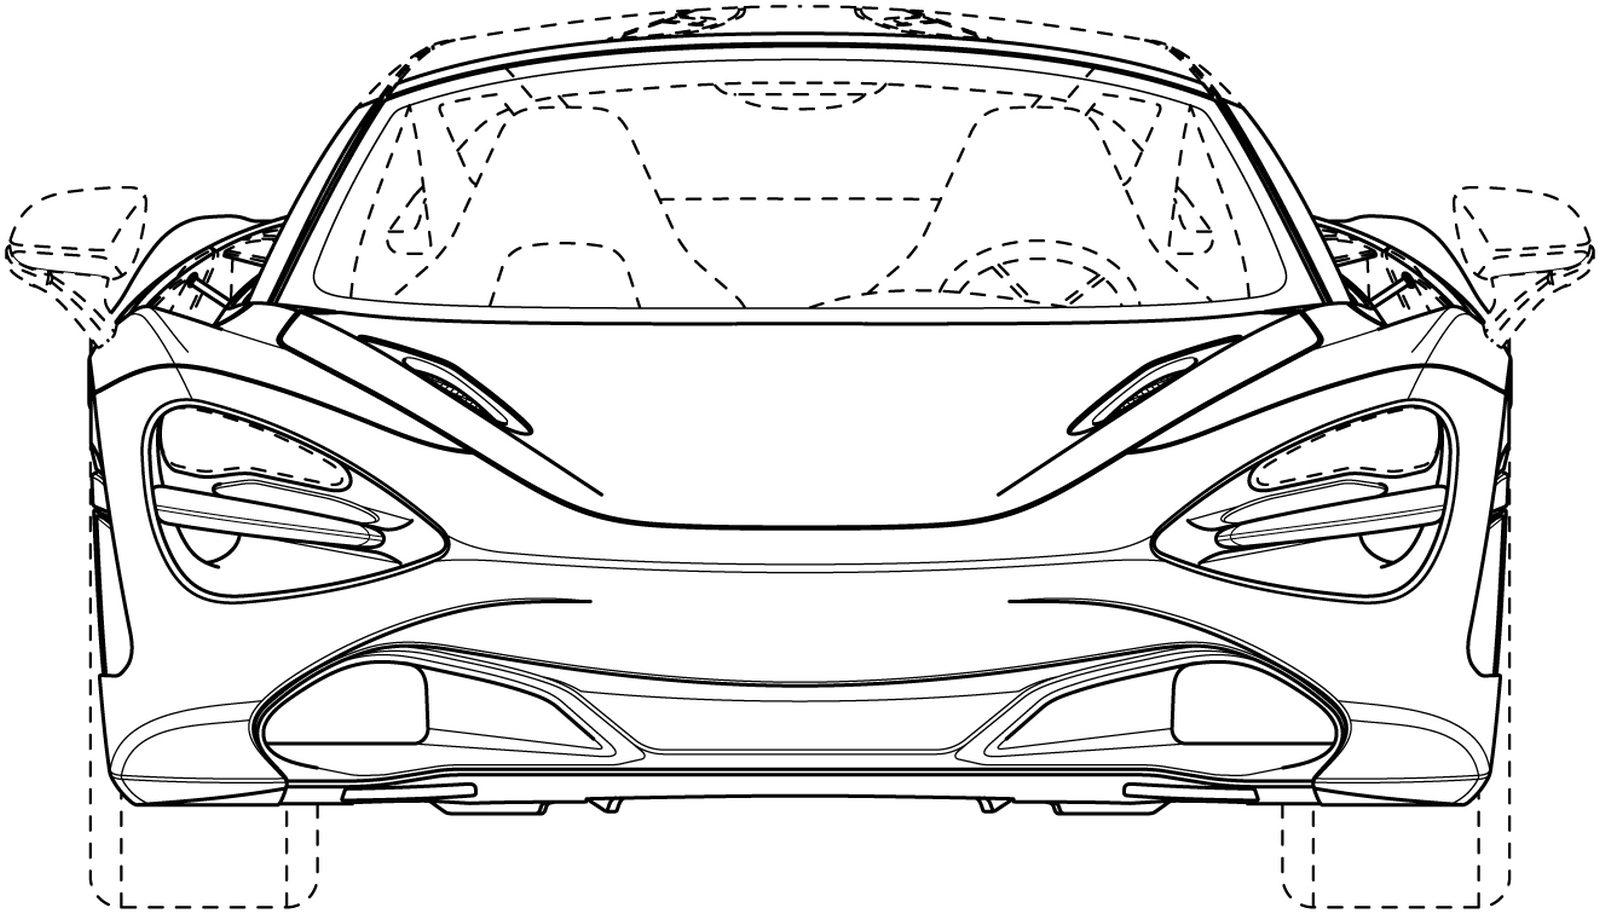 McLaren 720S Spider sketch design brevetti